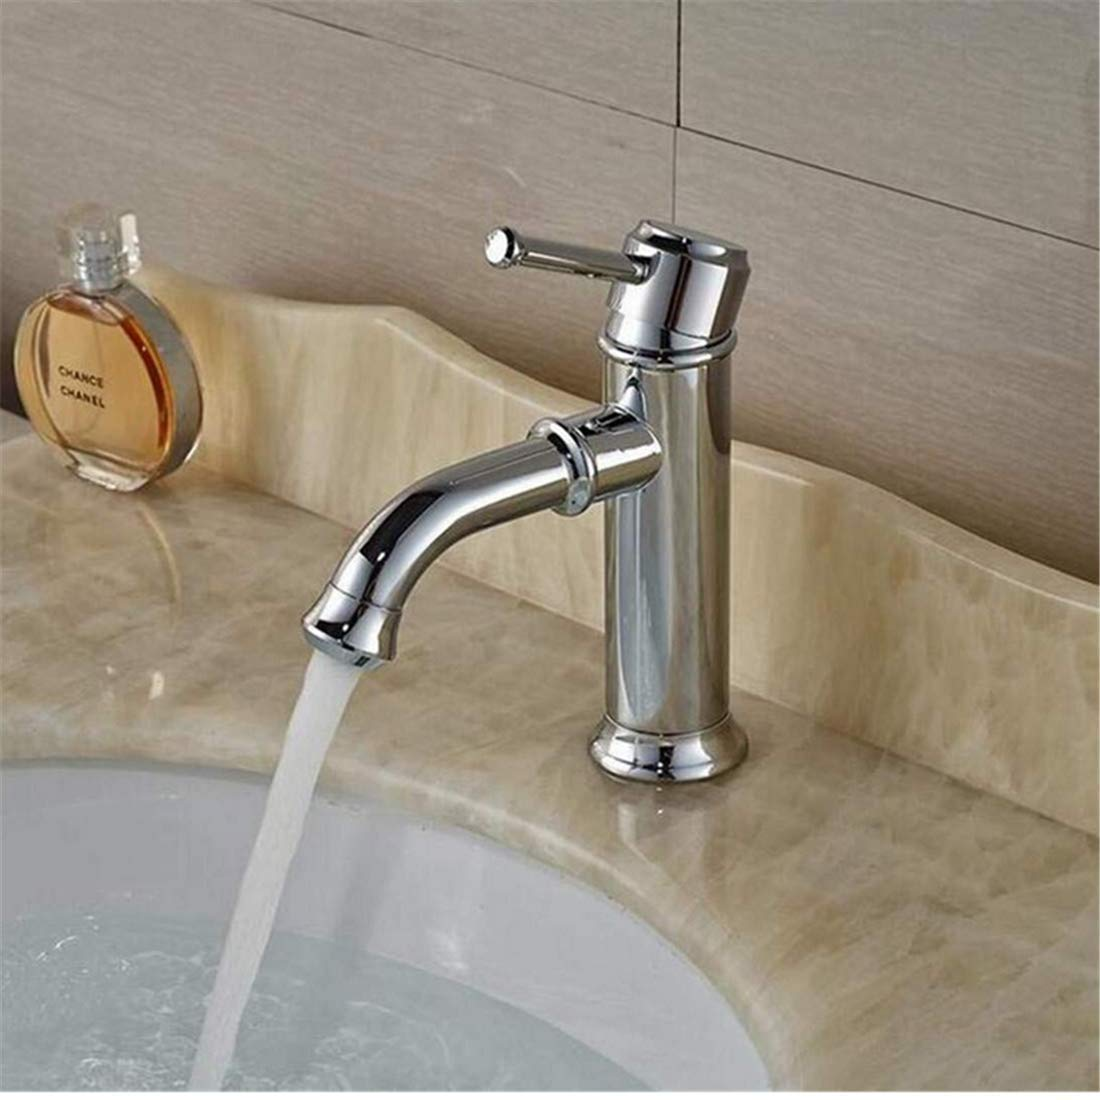 Armaturen Becken Mixerwater Saving Infrarot Induktiver Wasserhahn Batterieleistung